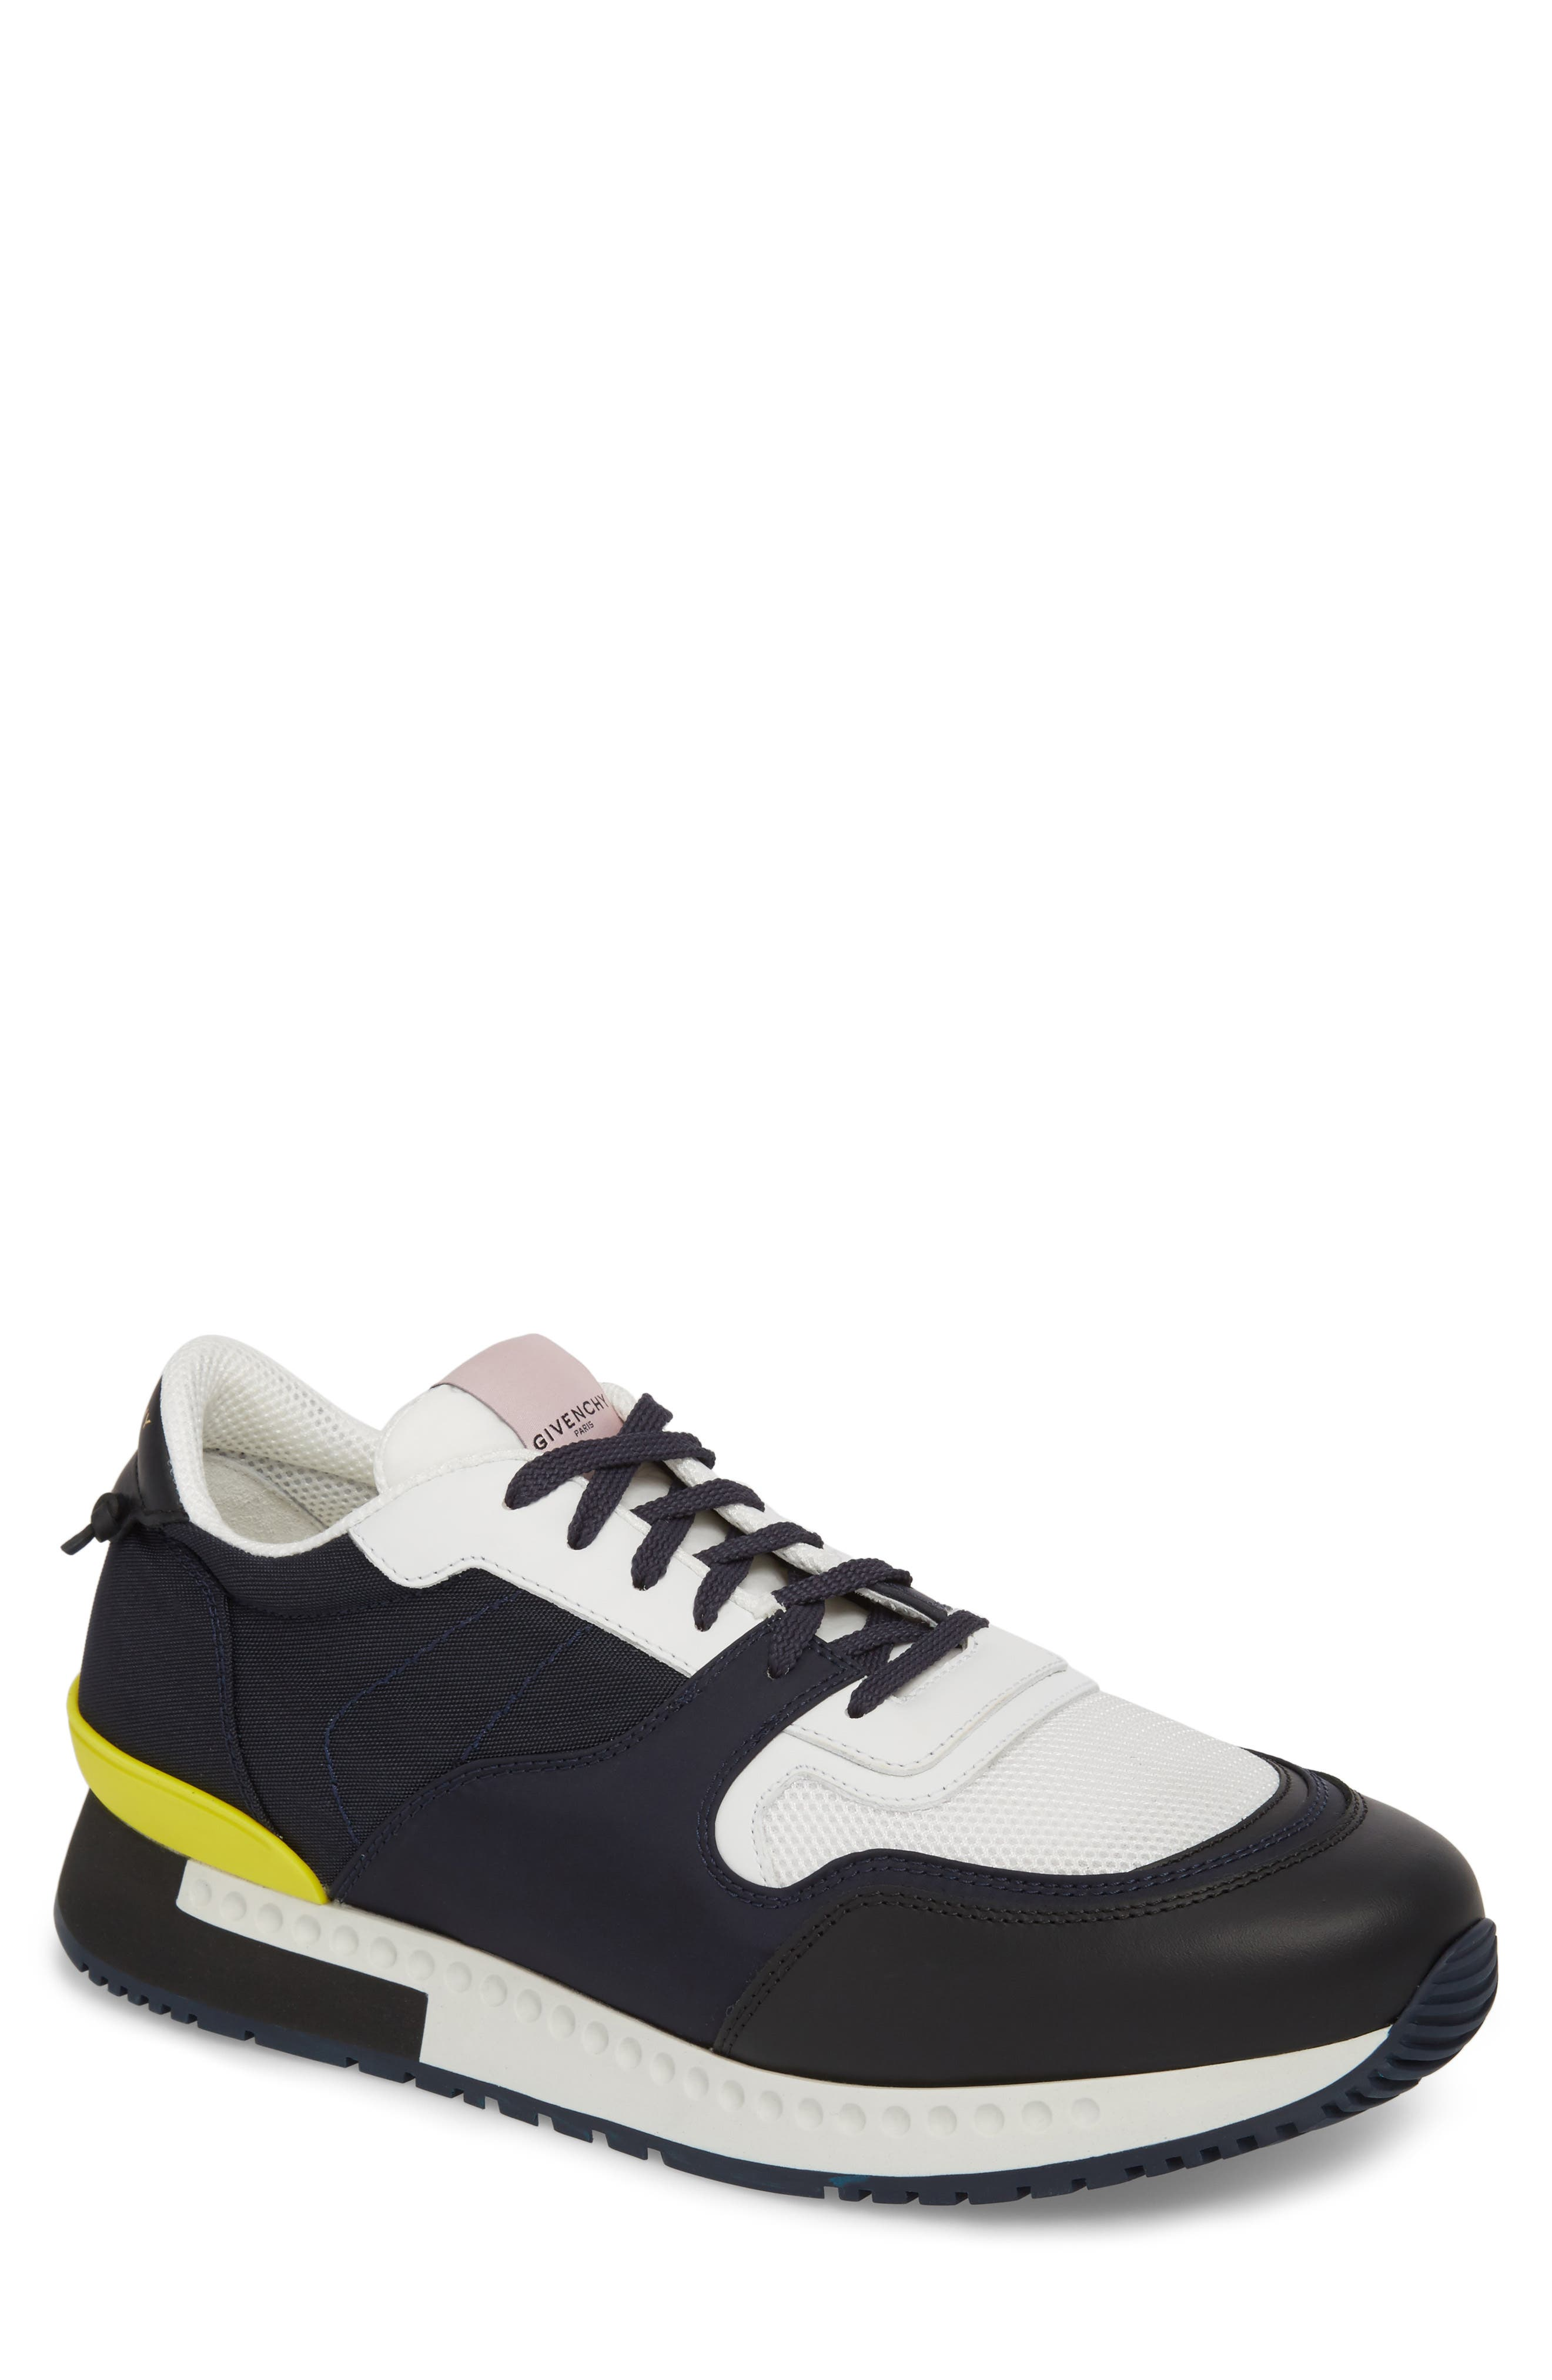 Main Image - Givenchy 'Active Runner' Sneaker (Men)